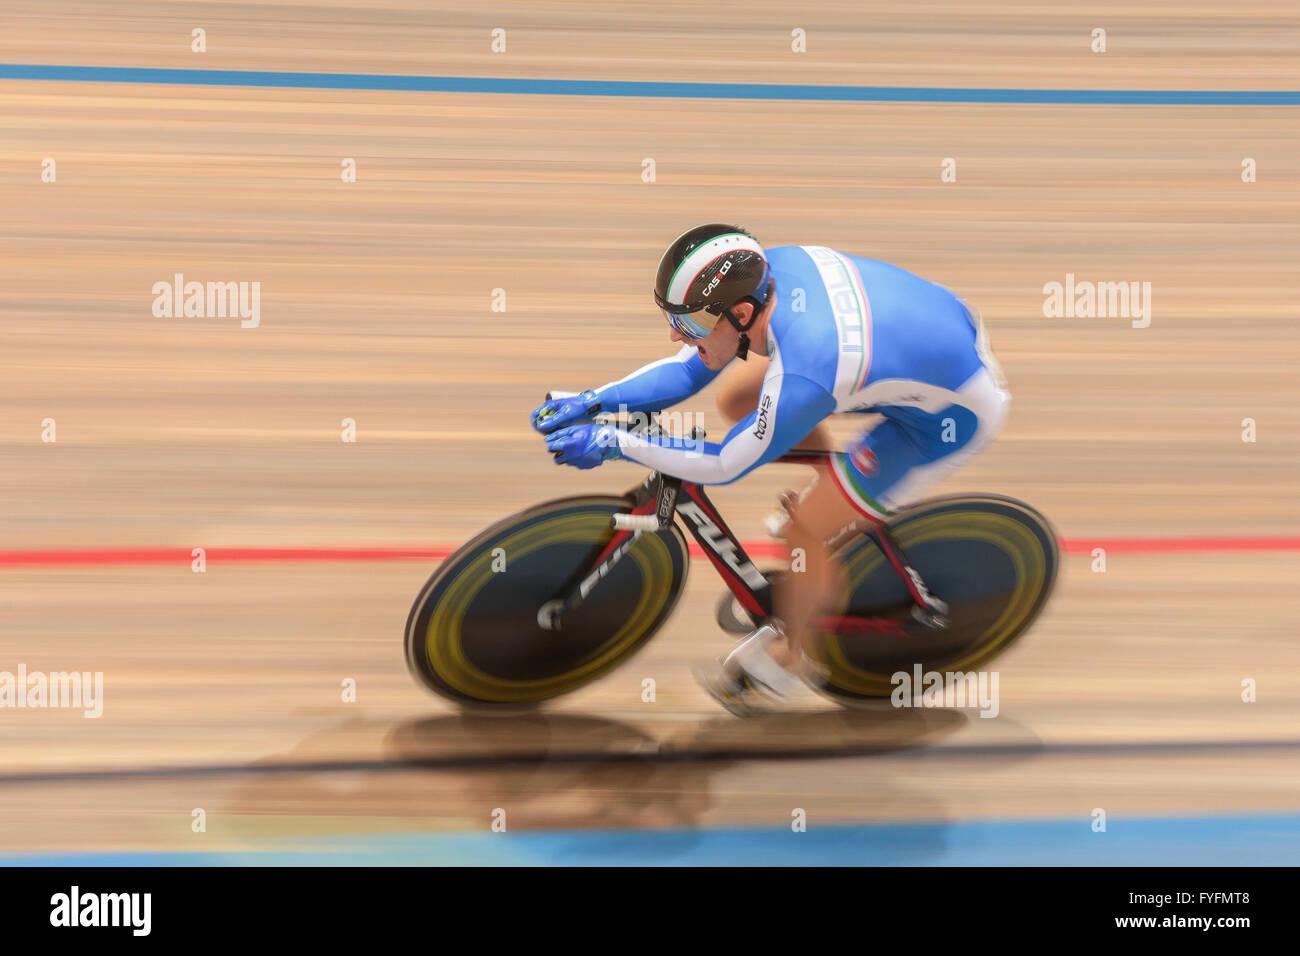 Francesco Ceci, Italy, wins the men's elite kilometre time trial finals at the GP Vienna 2013, Ferry-Dusika - Stock Image